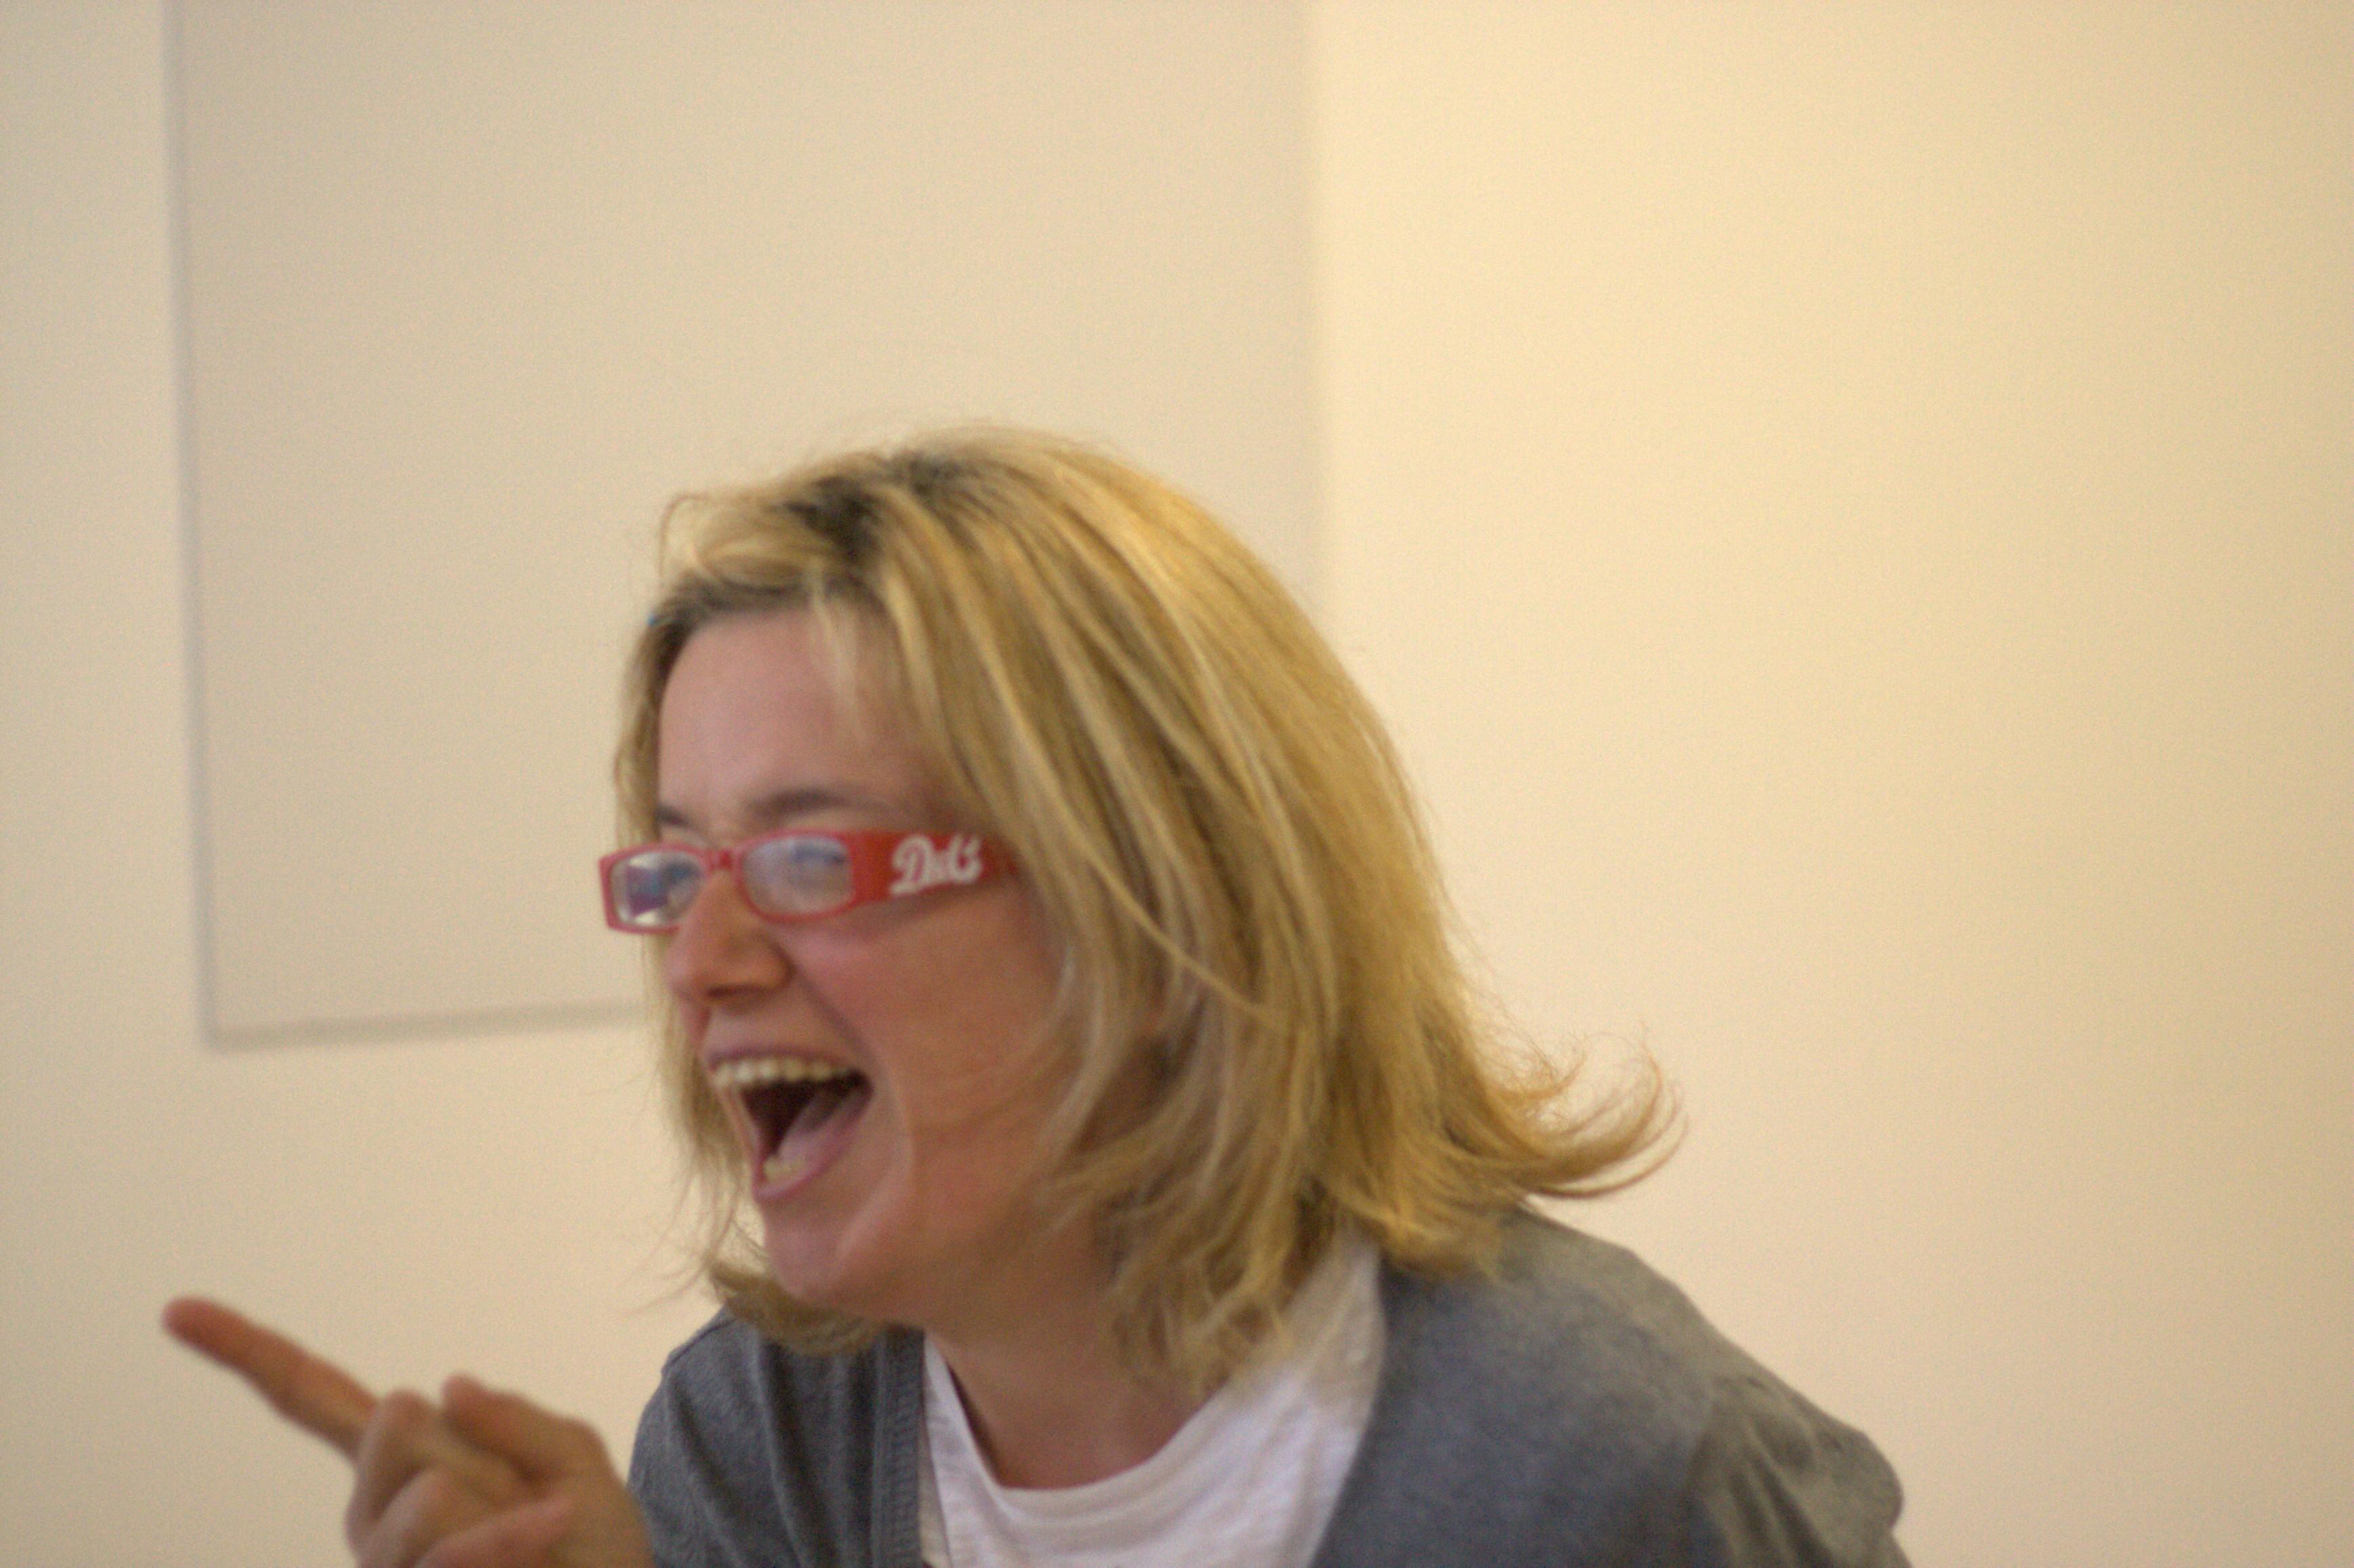 Martina Bartolacci